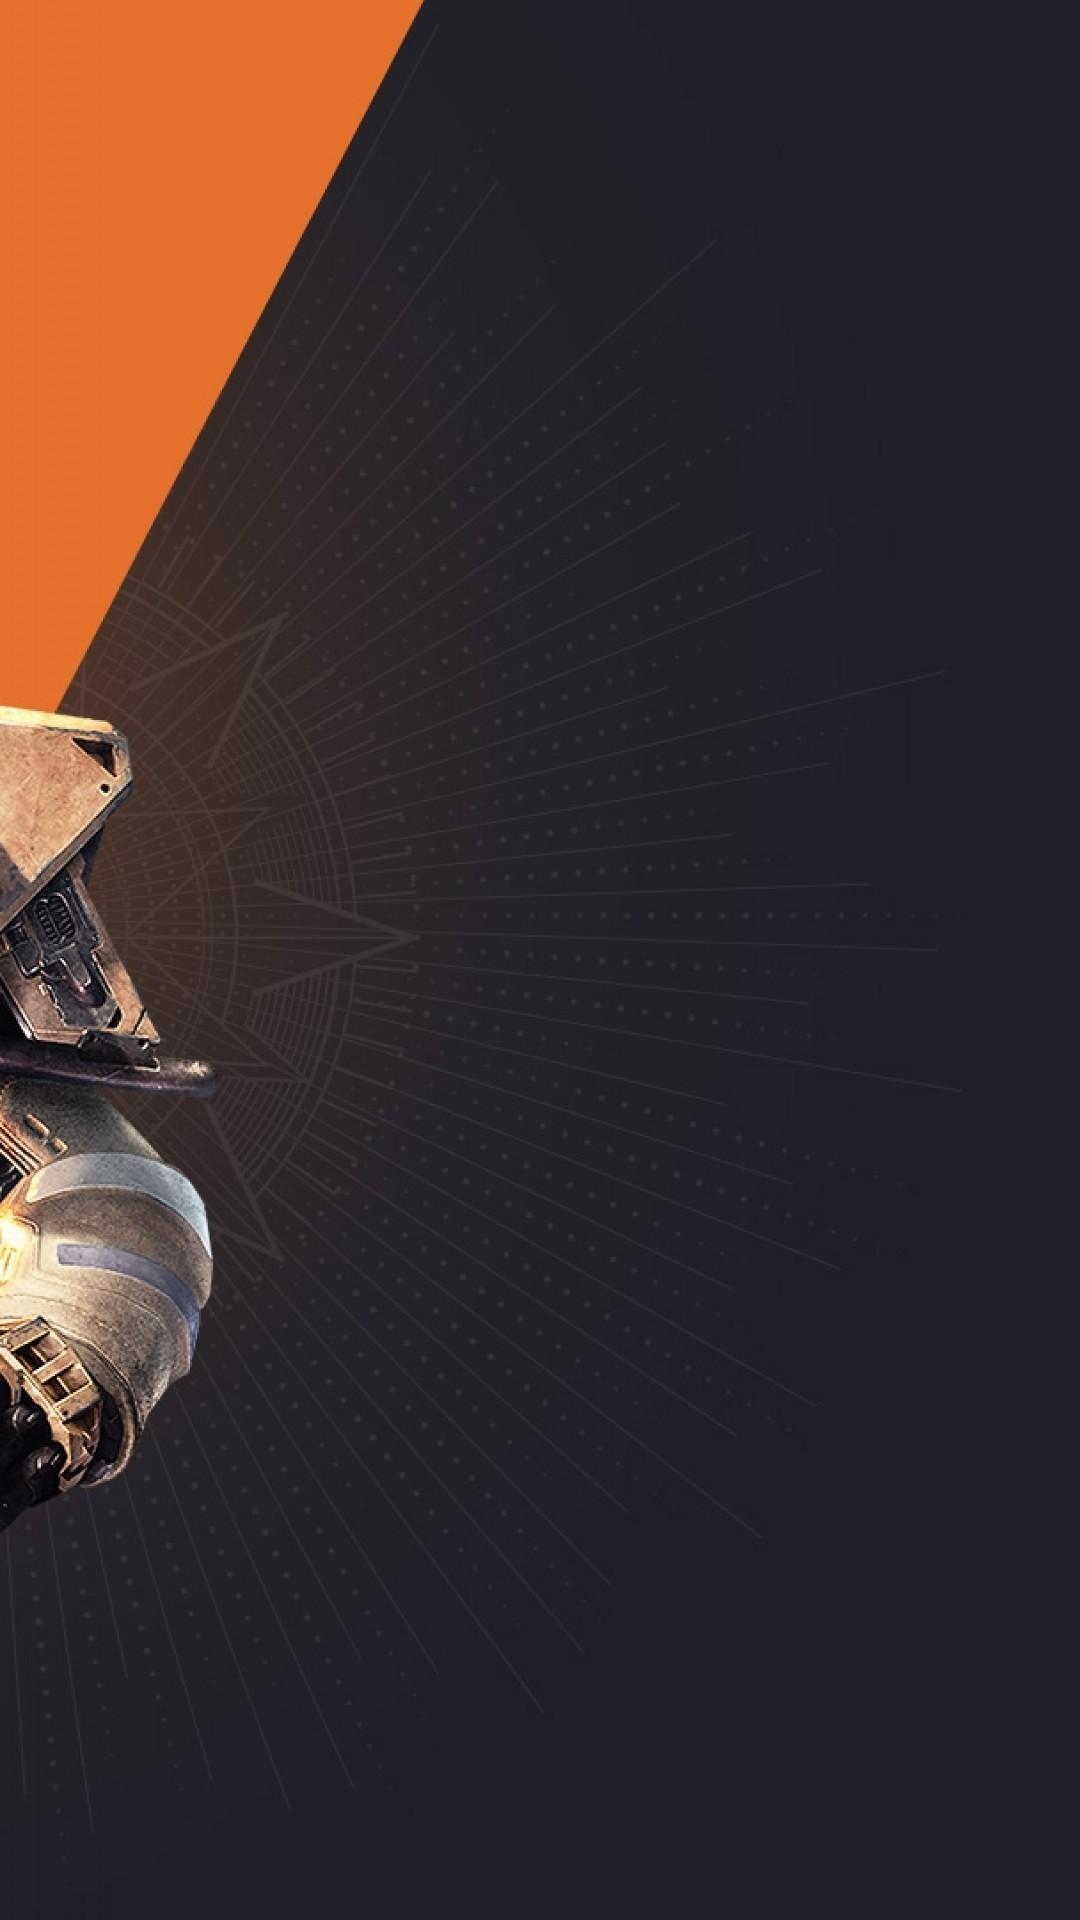 Destiny The Taken King, Sci-fi, Robot, Flame